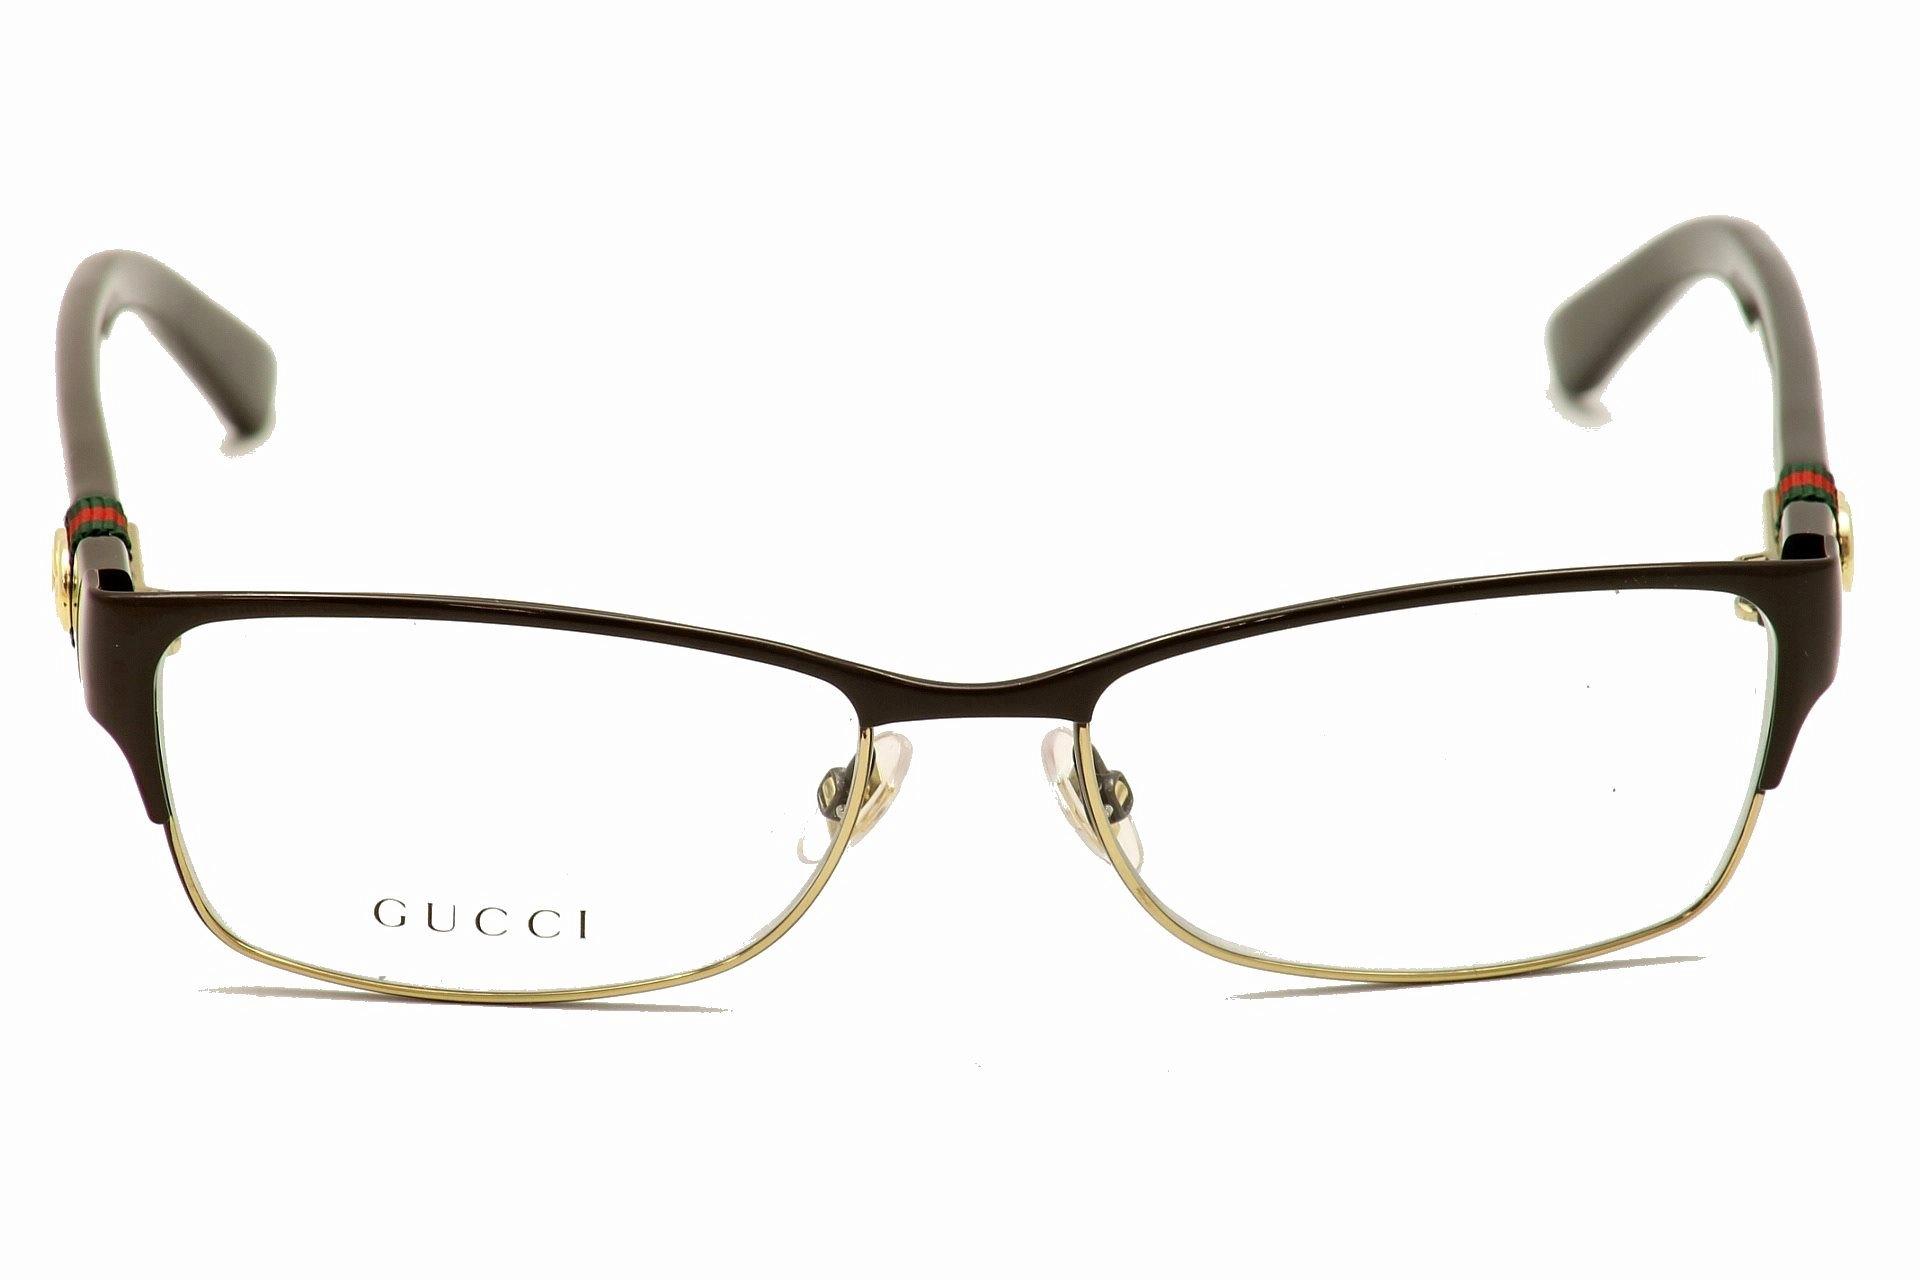 gucci womens eyeglasses 4244 full rim optical frame by gucci - Womens Gucci Frames